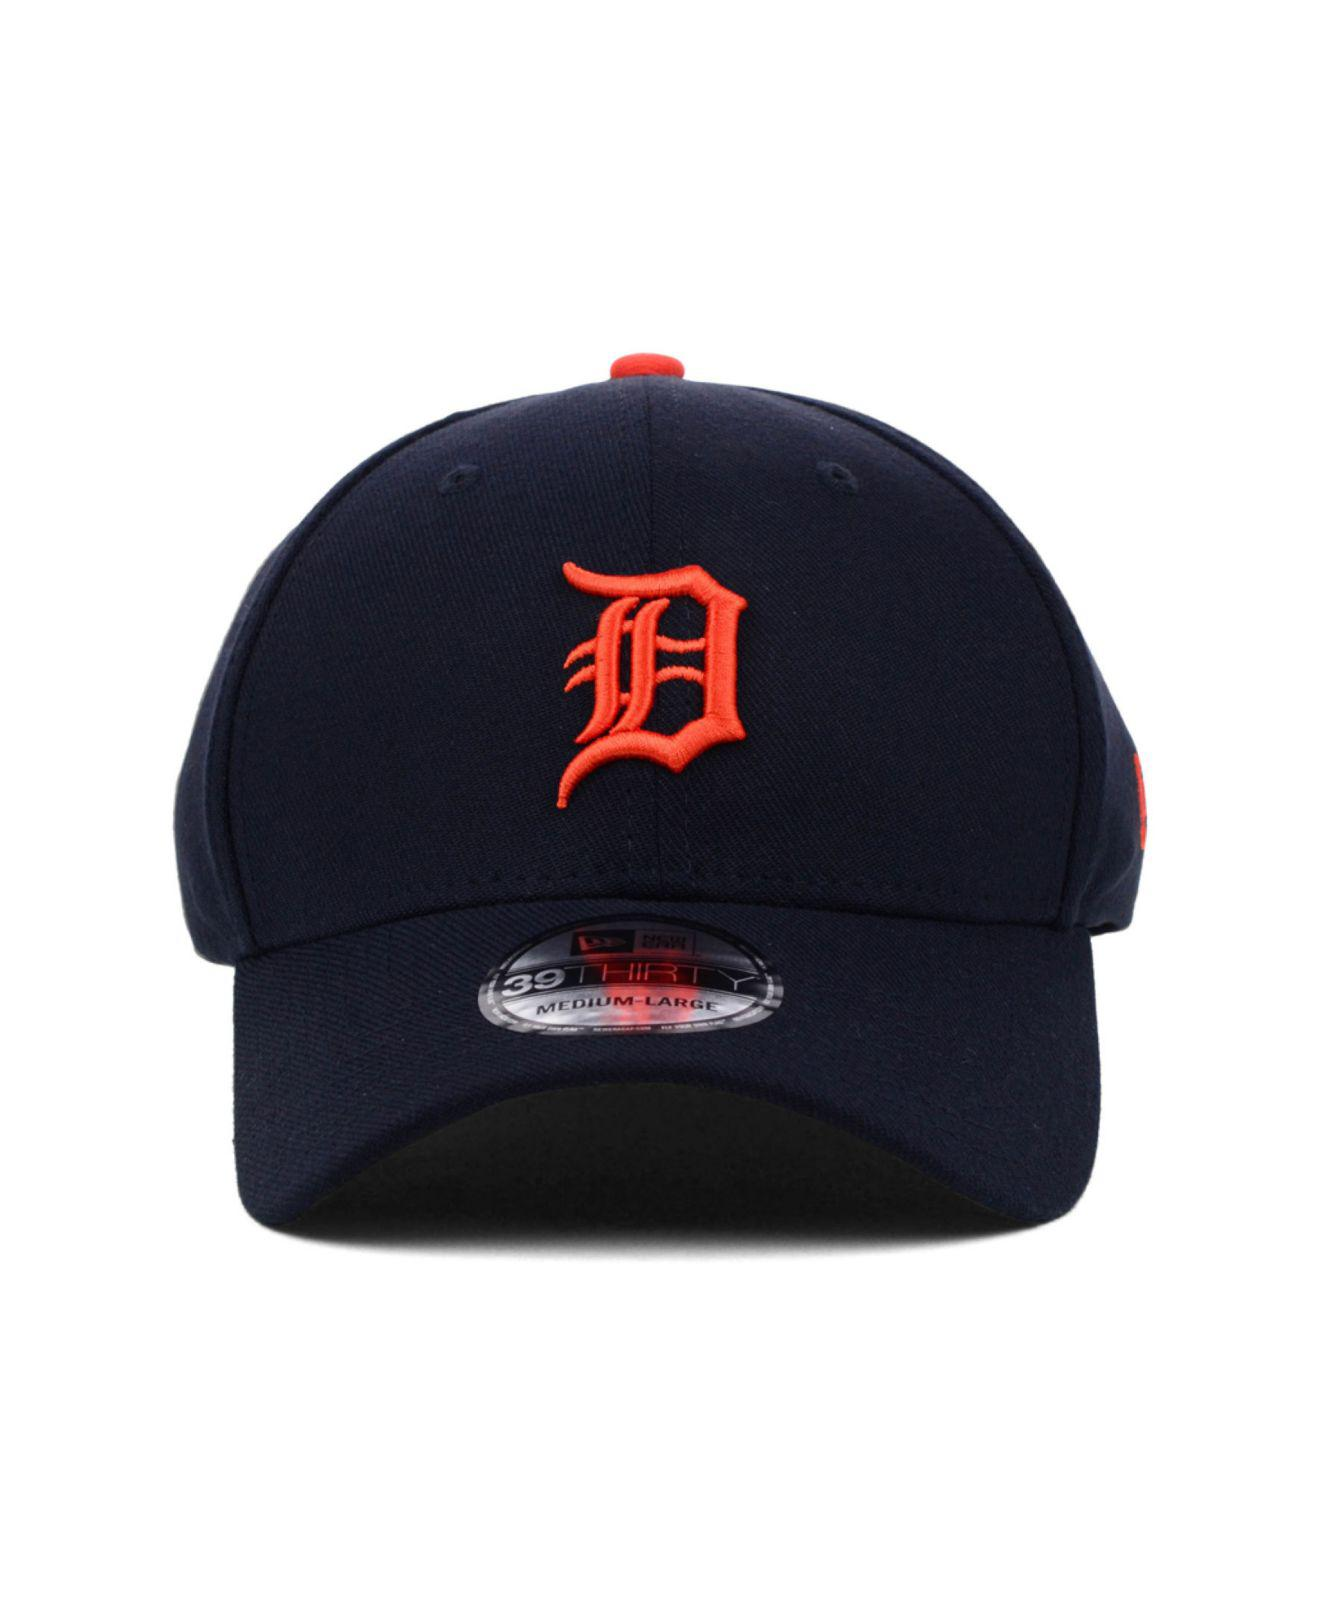 detailing 39399 7f878 ... Detroit Tigers Mlb Team Classic 39thirty Cap for Men - Lyst. View  fullscreen